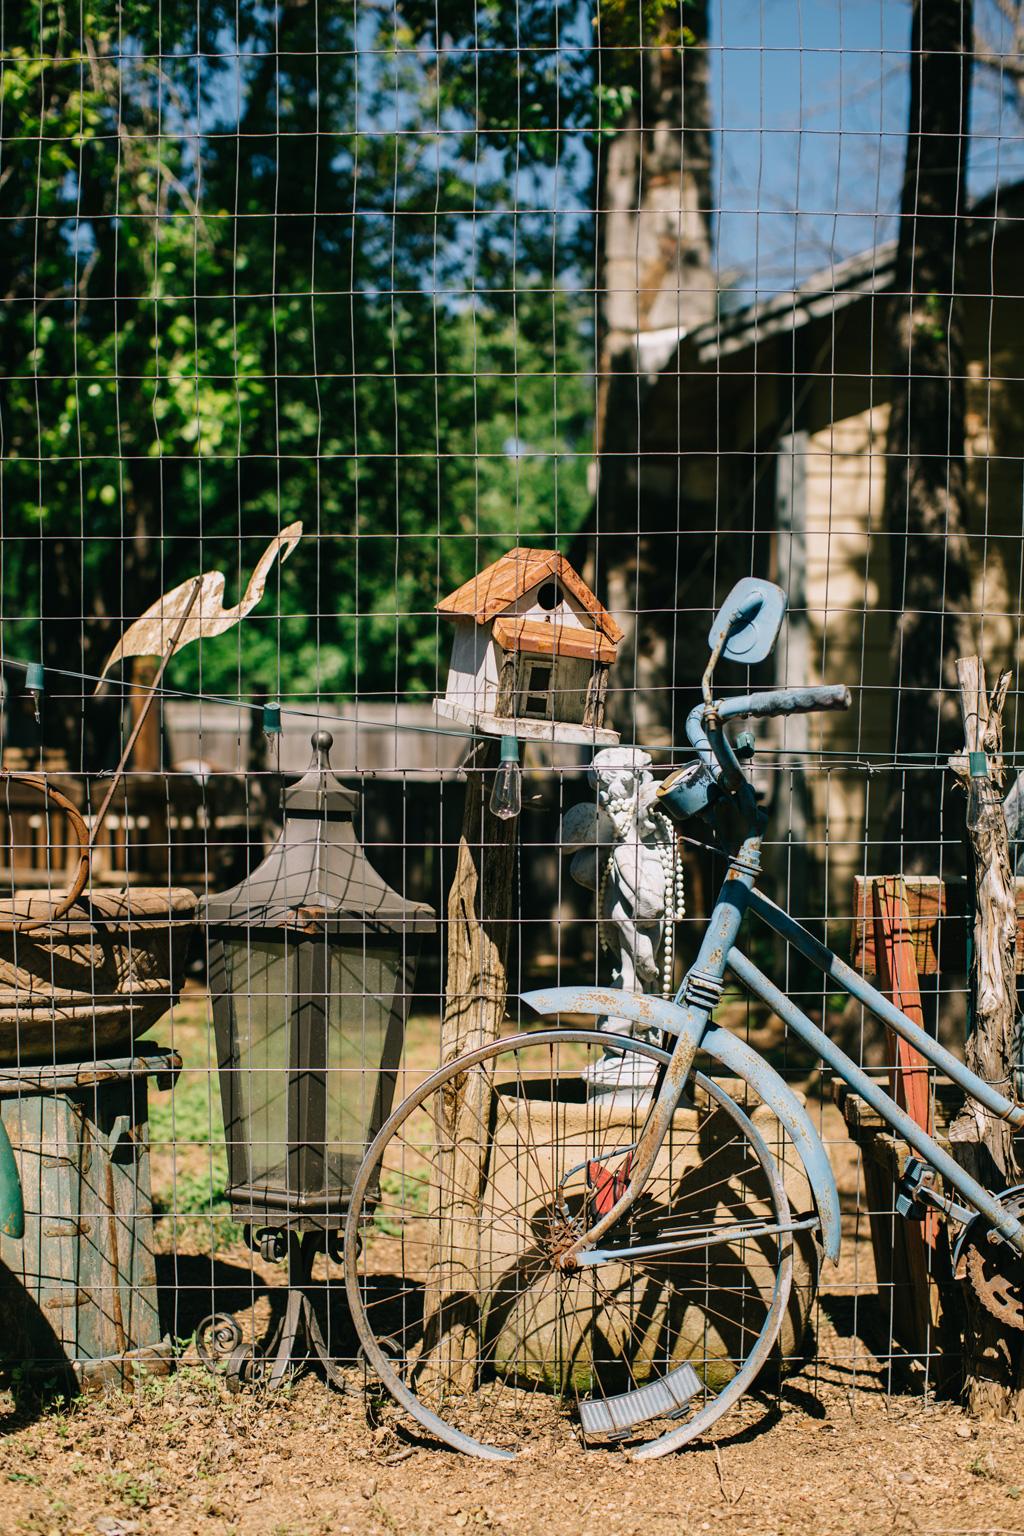 CindyGiovagnoli_Texas_Wimberly_Gruene_Cypress_Creek_HillCountry_outdoors-012.jpg